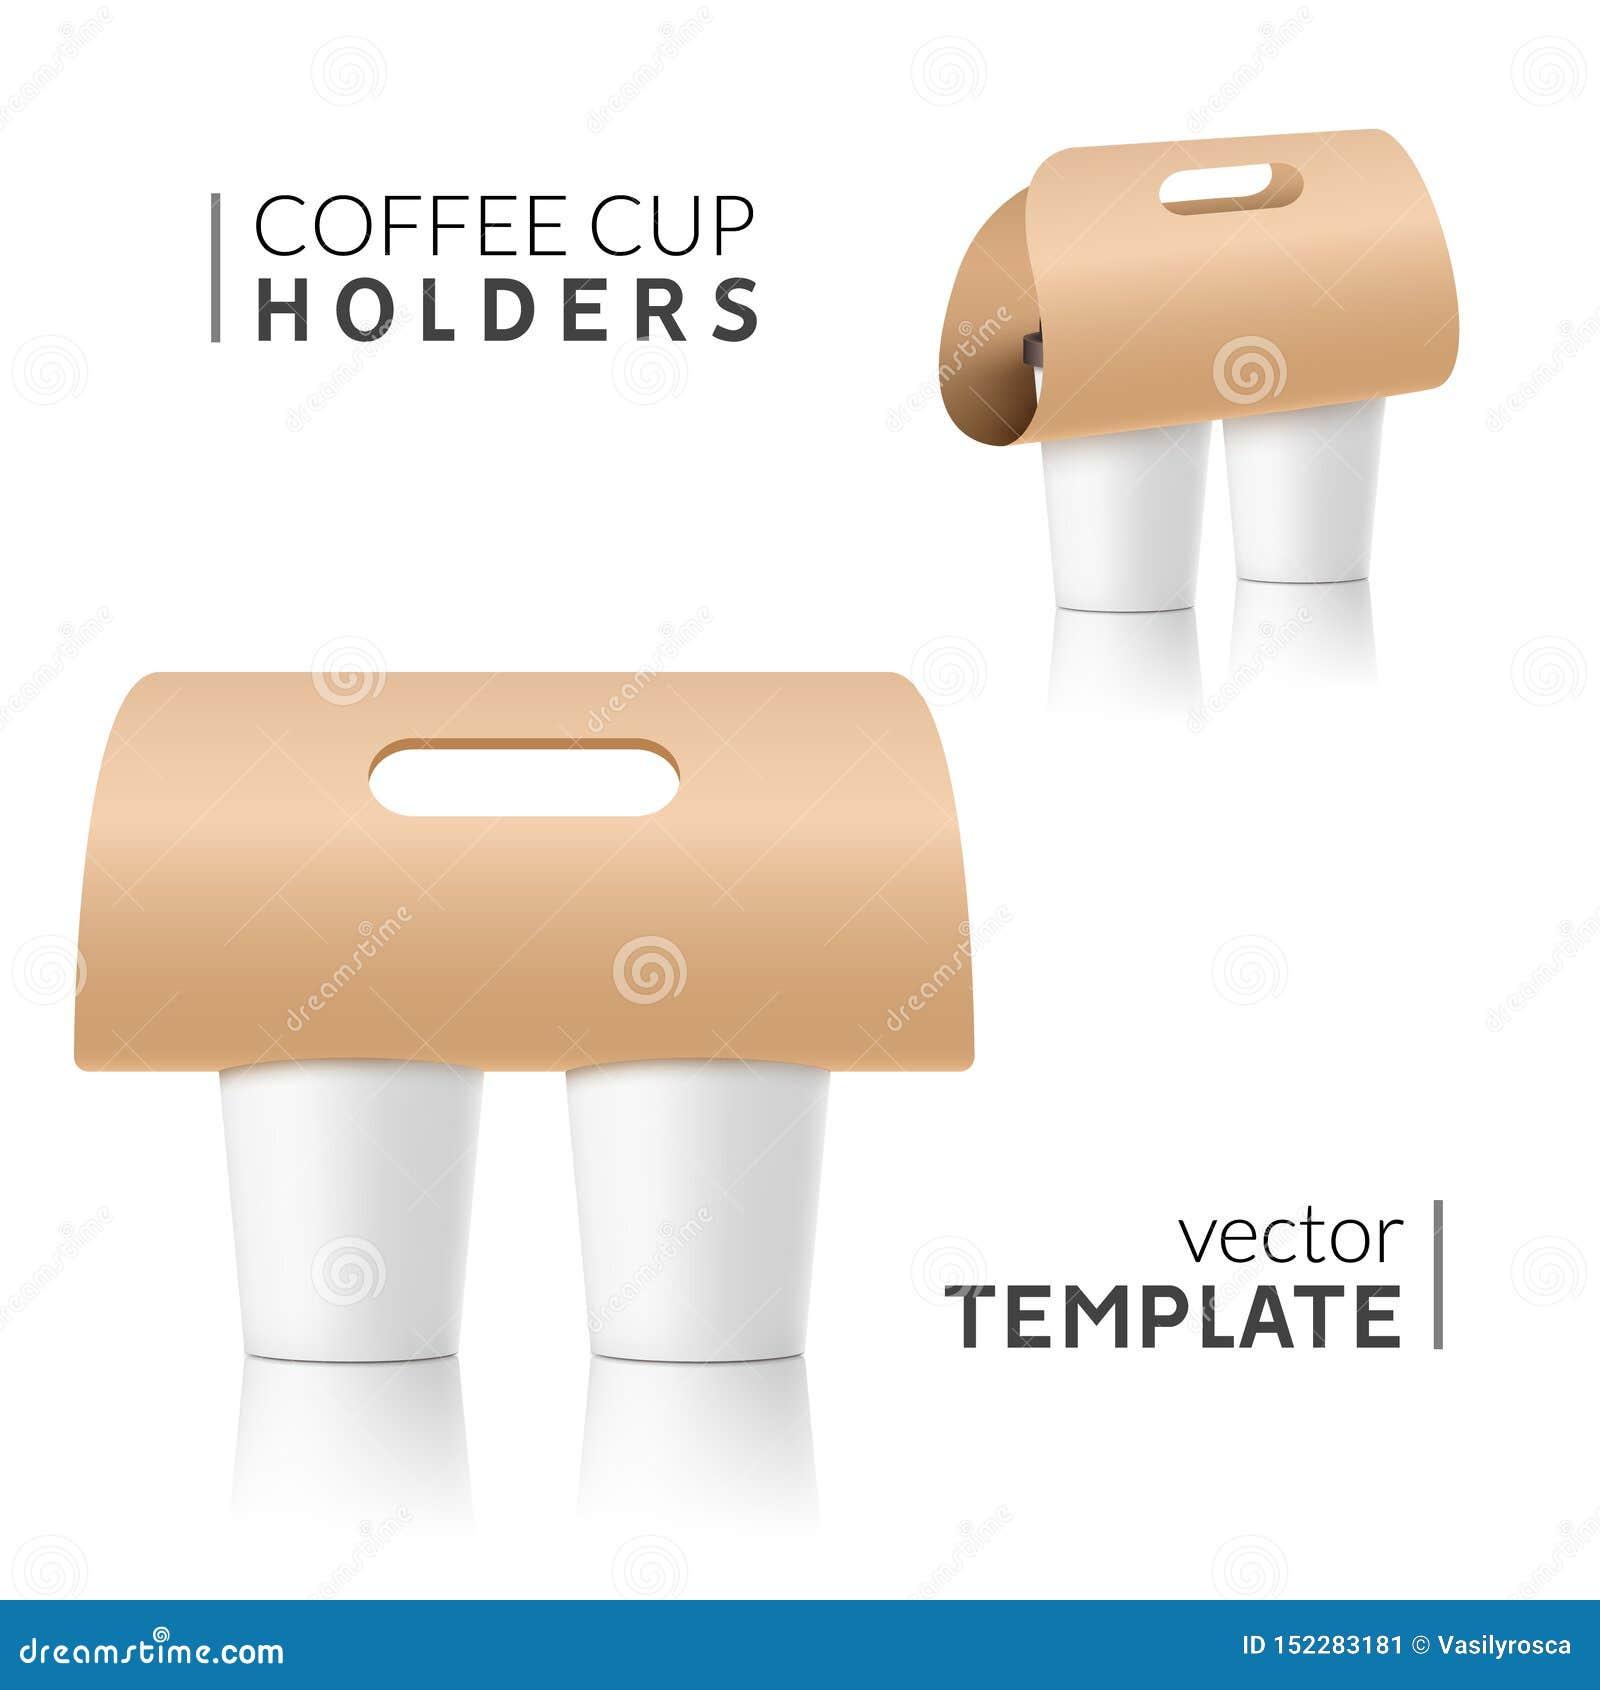 Coffee Cup Holder Paper Design Beverage Drink Handle Mockup Cardboard Coffee Cup Holder Takeaway Stock Vector Illustration Of Object Holder 152283181